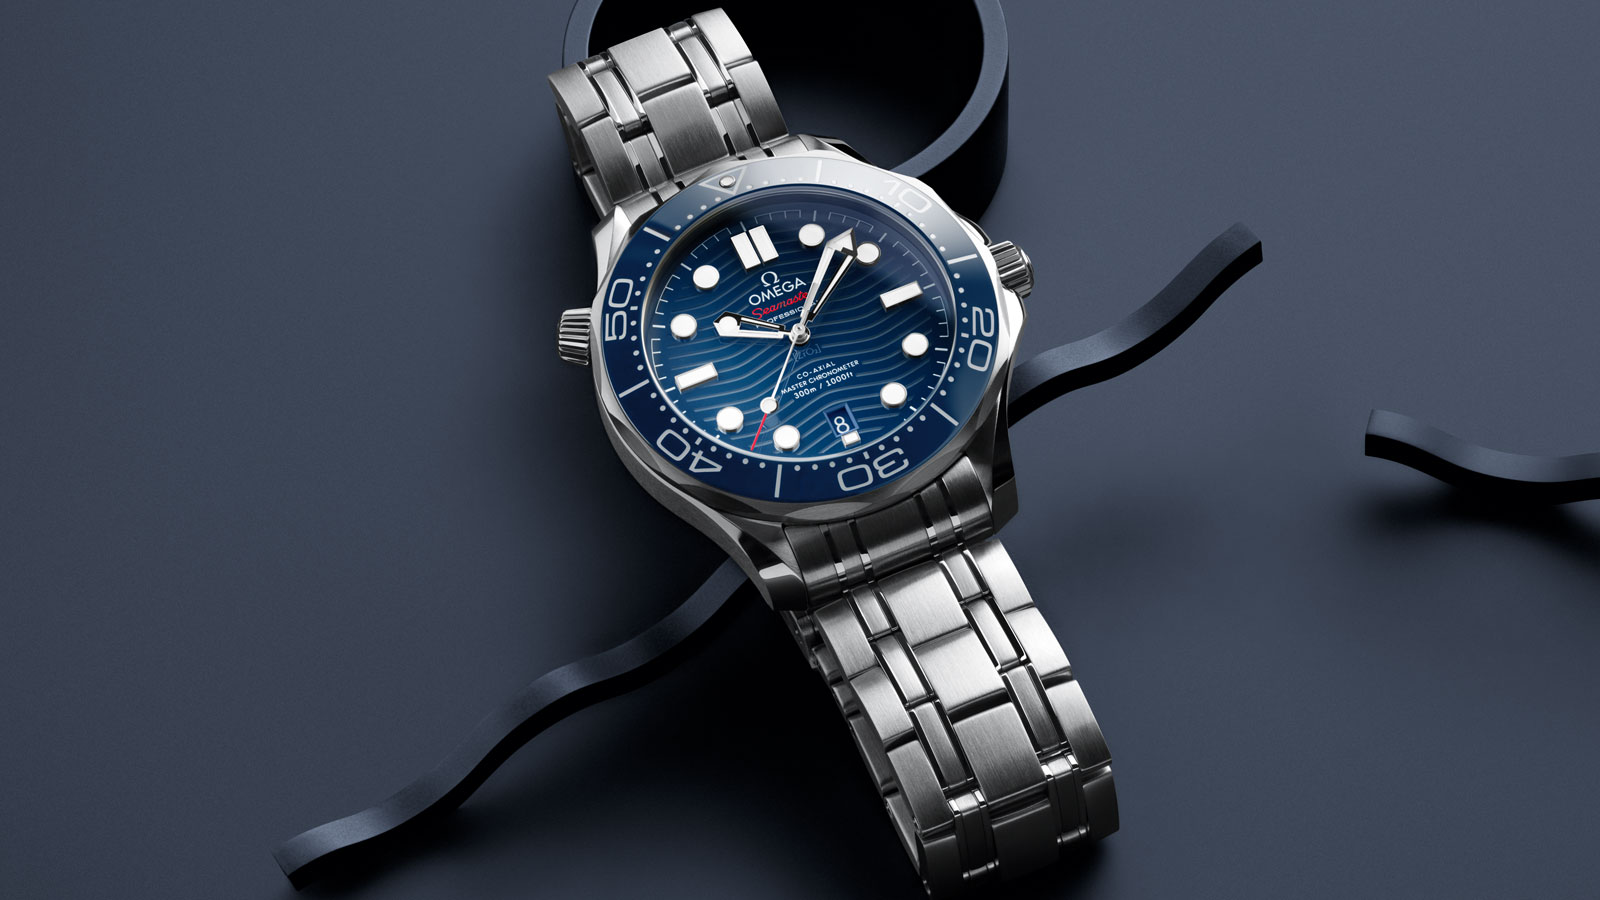 Seamaster 300米潜水表 300米潜水表 欧米茄同轴•至臻天文台表42毫米 - 210.30.42.20.03.001 - 查看 1